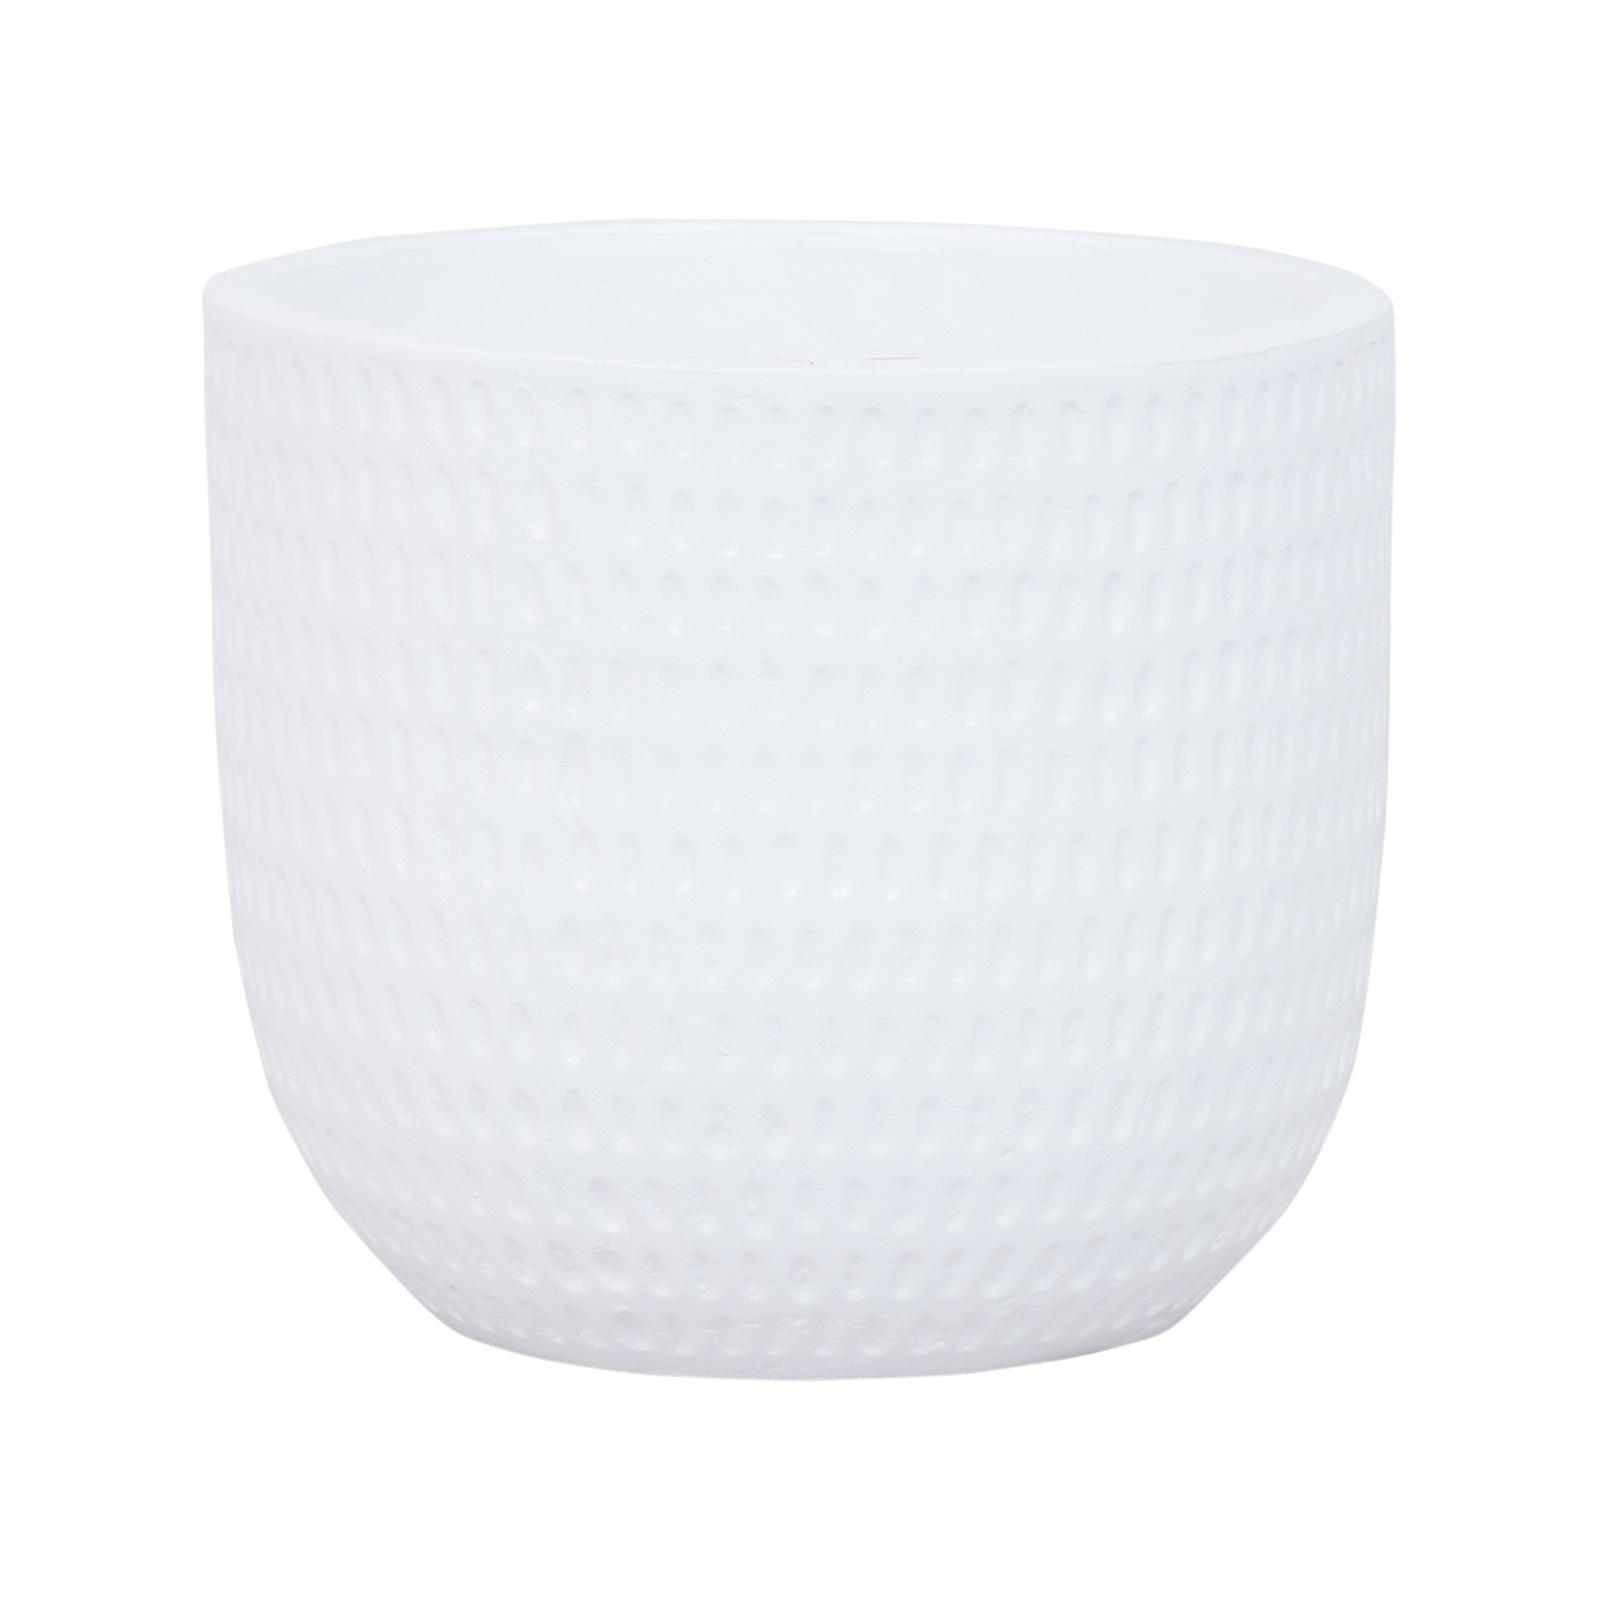 Lotus 23.5 x 21cm White Large Dotty Ceramic Egg Pot